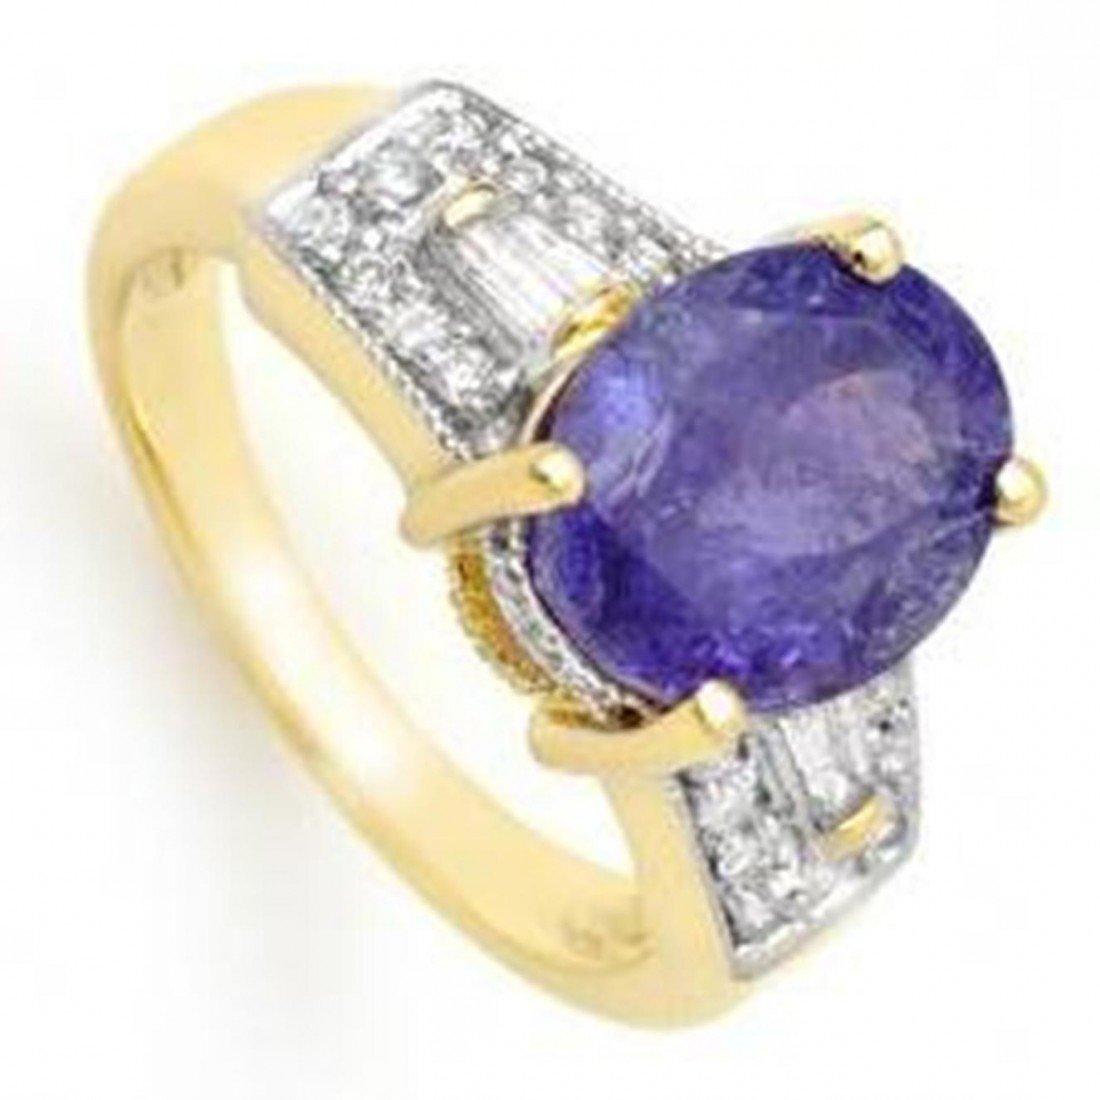 3W: 5.55ctw Tanzanite & Diamond Ring 10K Yellow Gold